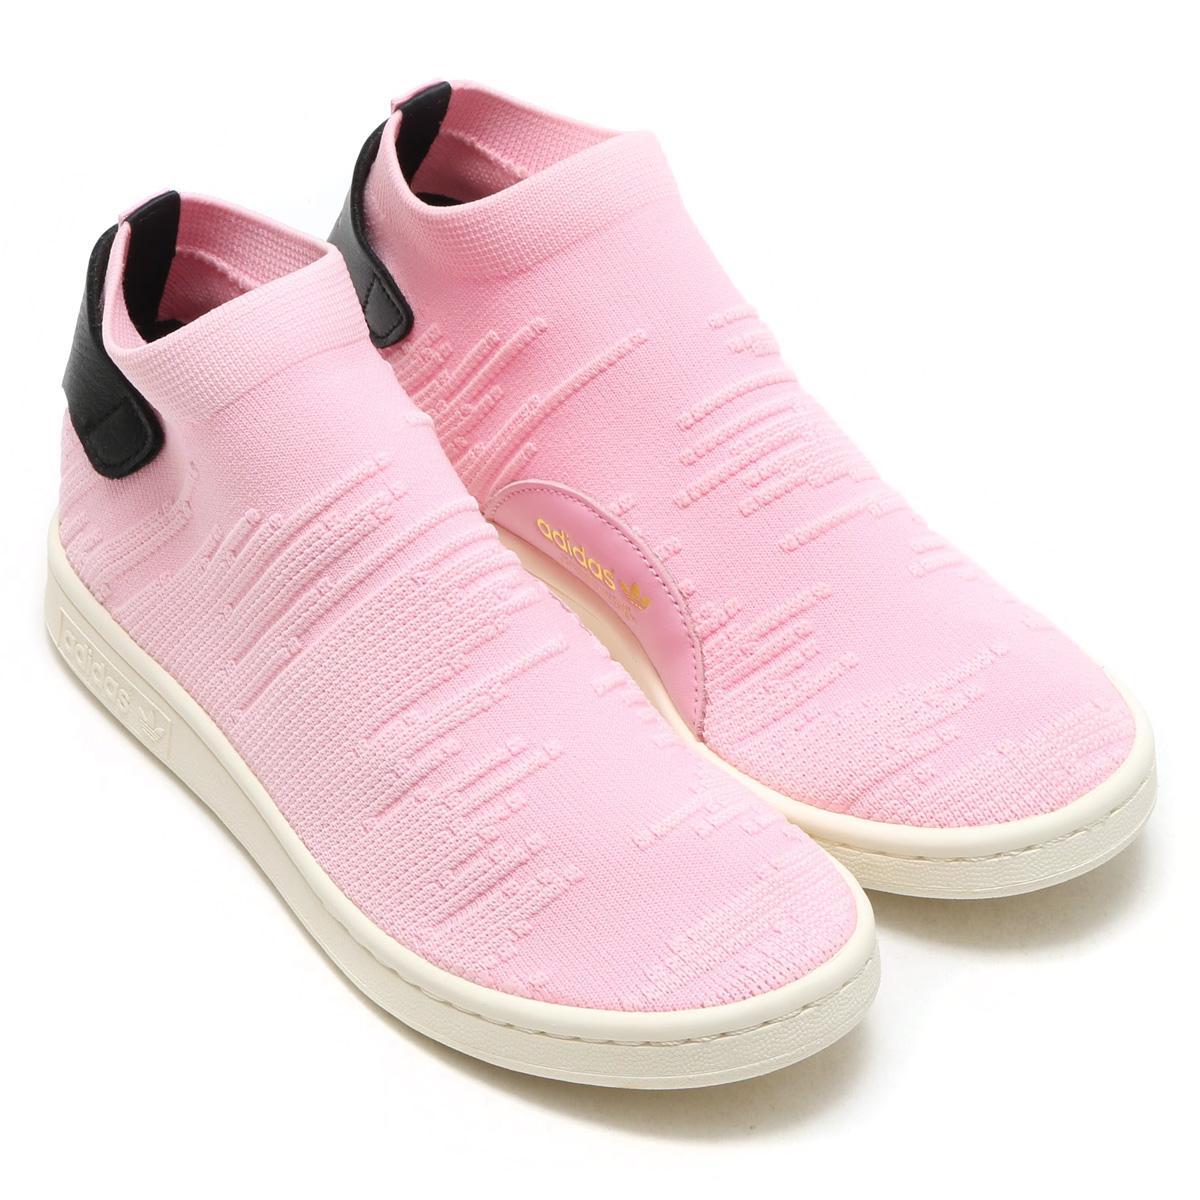 adidas STAN SMITH SOCK PK W(アディダス スタン スミス ソック PK W)PINK【レディース スニーカー】17FW-S